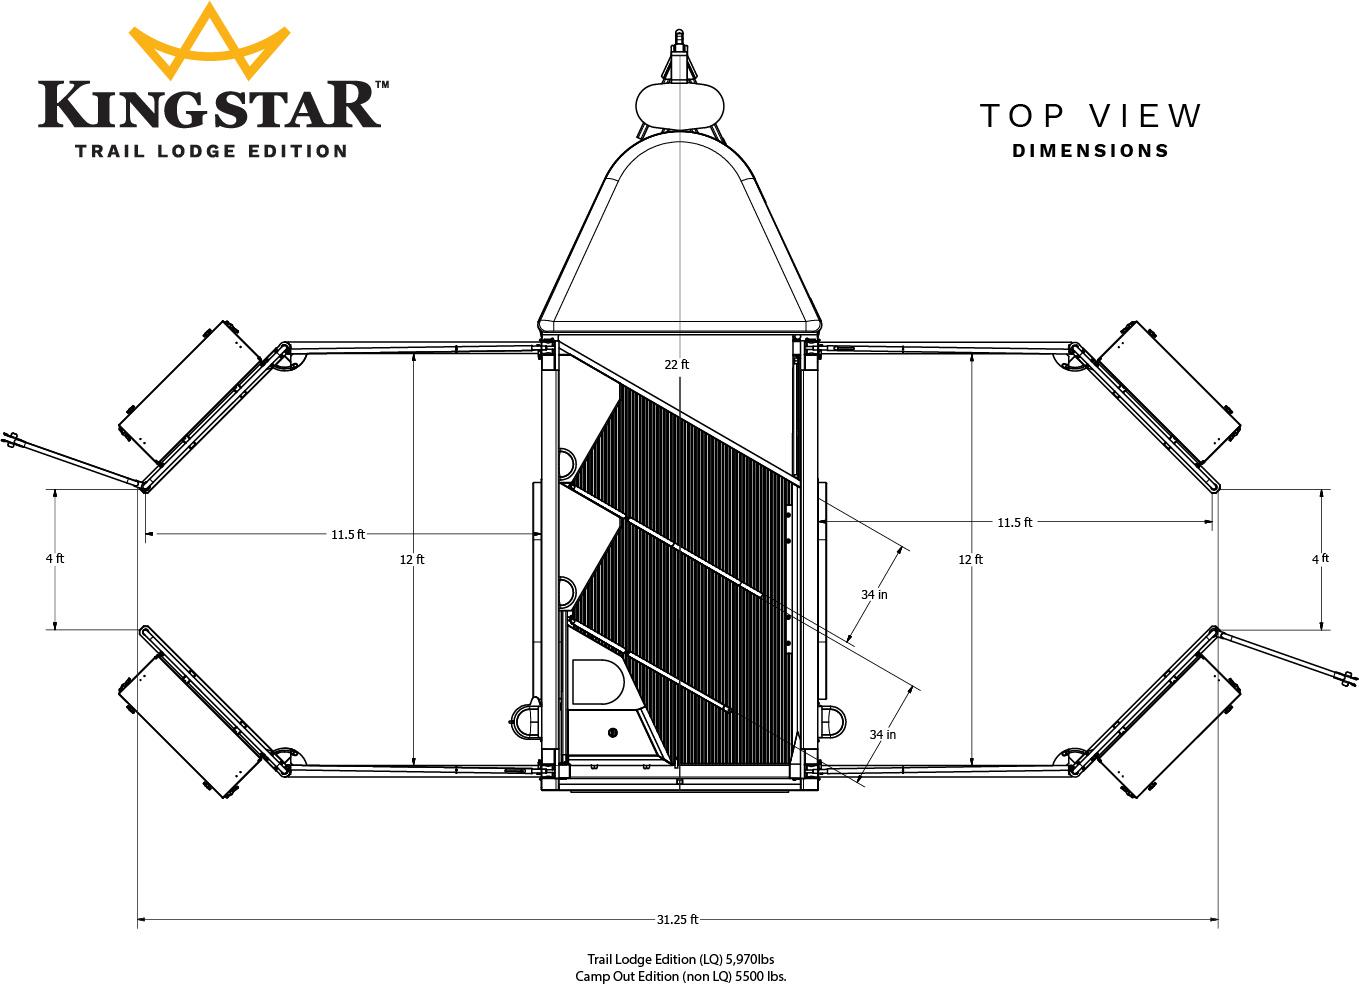 KingStar horse trailer top view dimensions